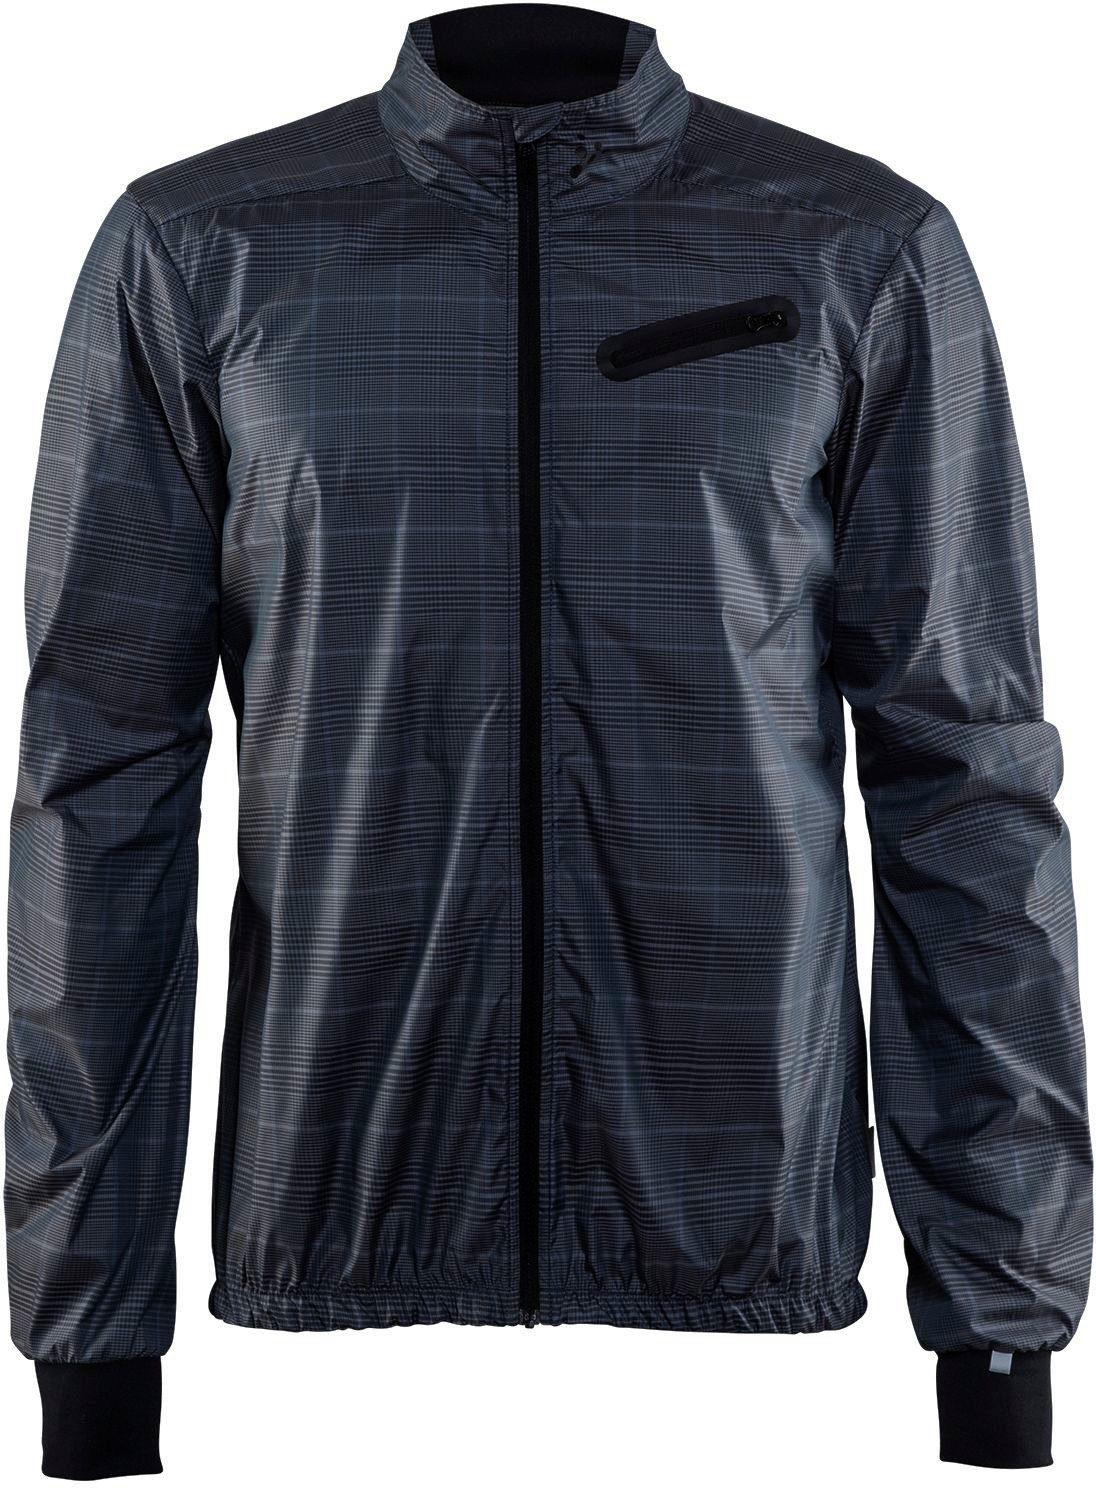 Craft Radjacke »Ride Wind Jacket Men«